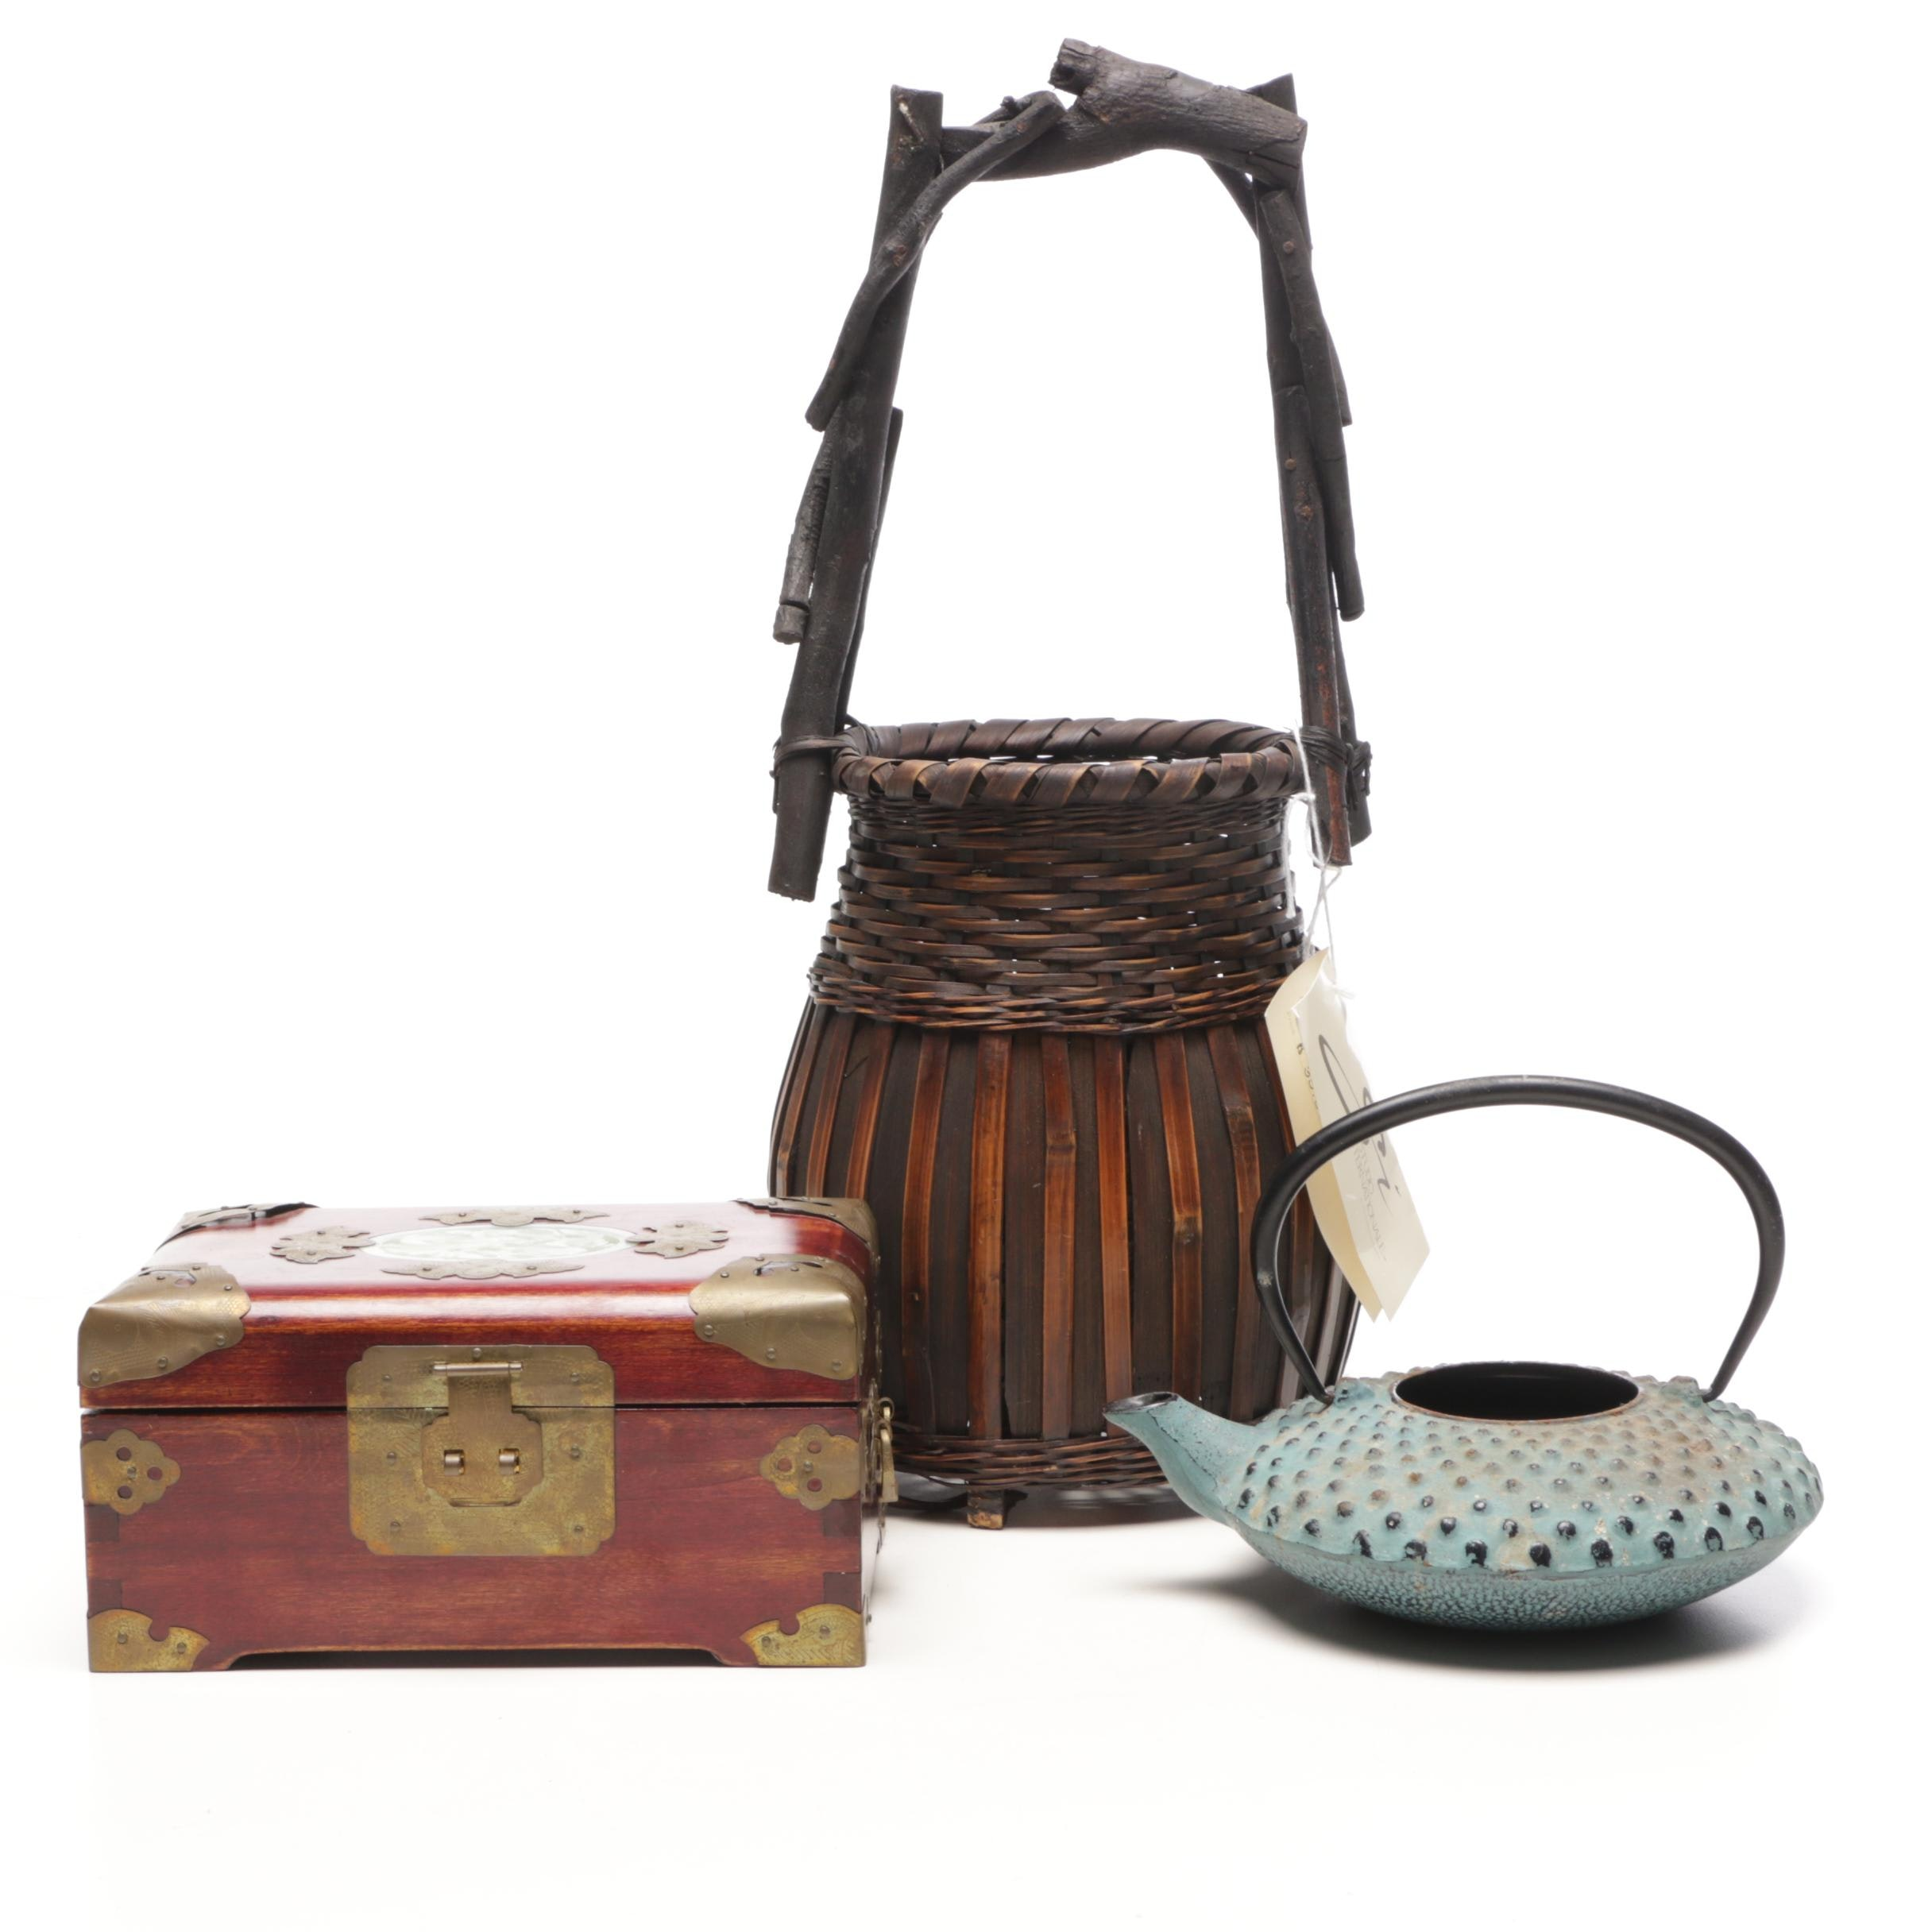 Japanese Ikebana Basket with Iron Kettle and Chinese Jewelry Box